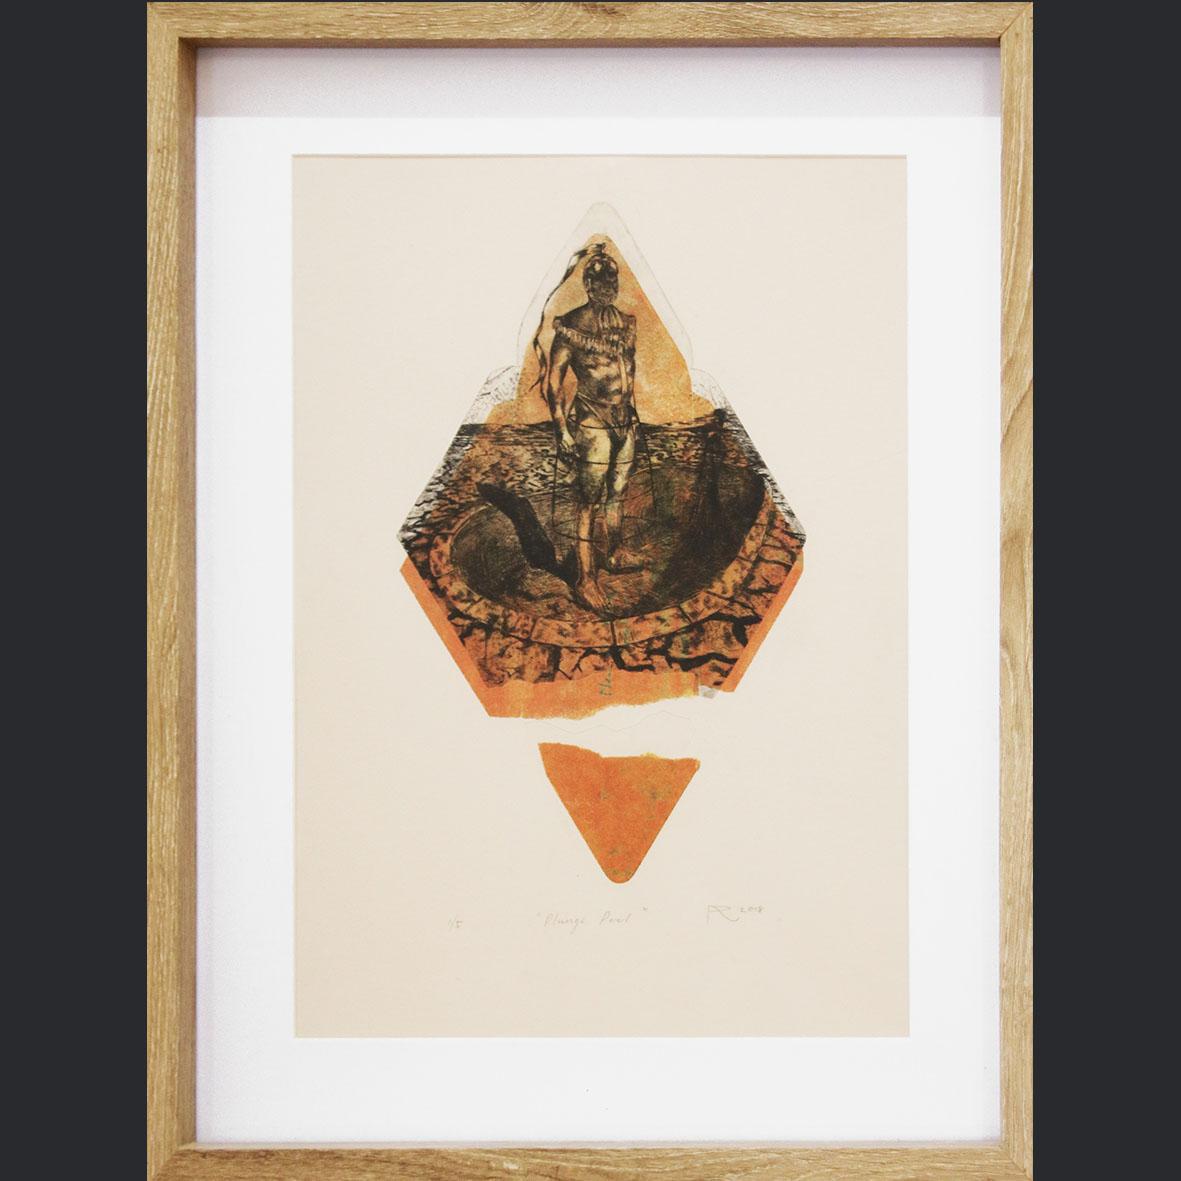 Adrian Ranger, Plunge Pool 1 of 5, 2018, Hyprid Print, 42.5 x 52.5 cm